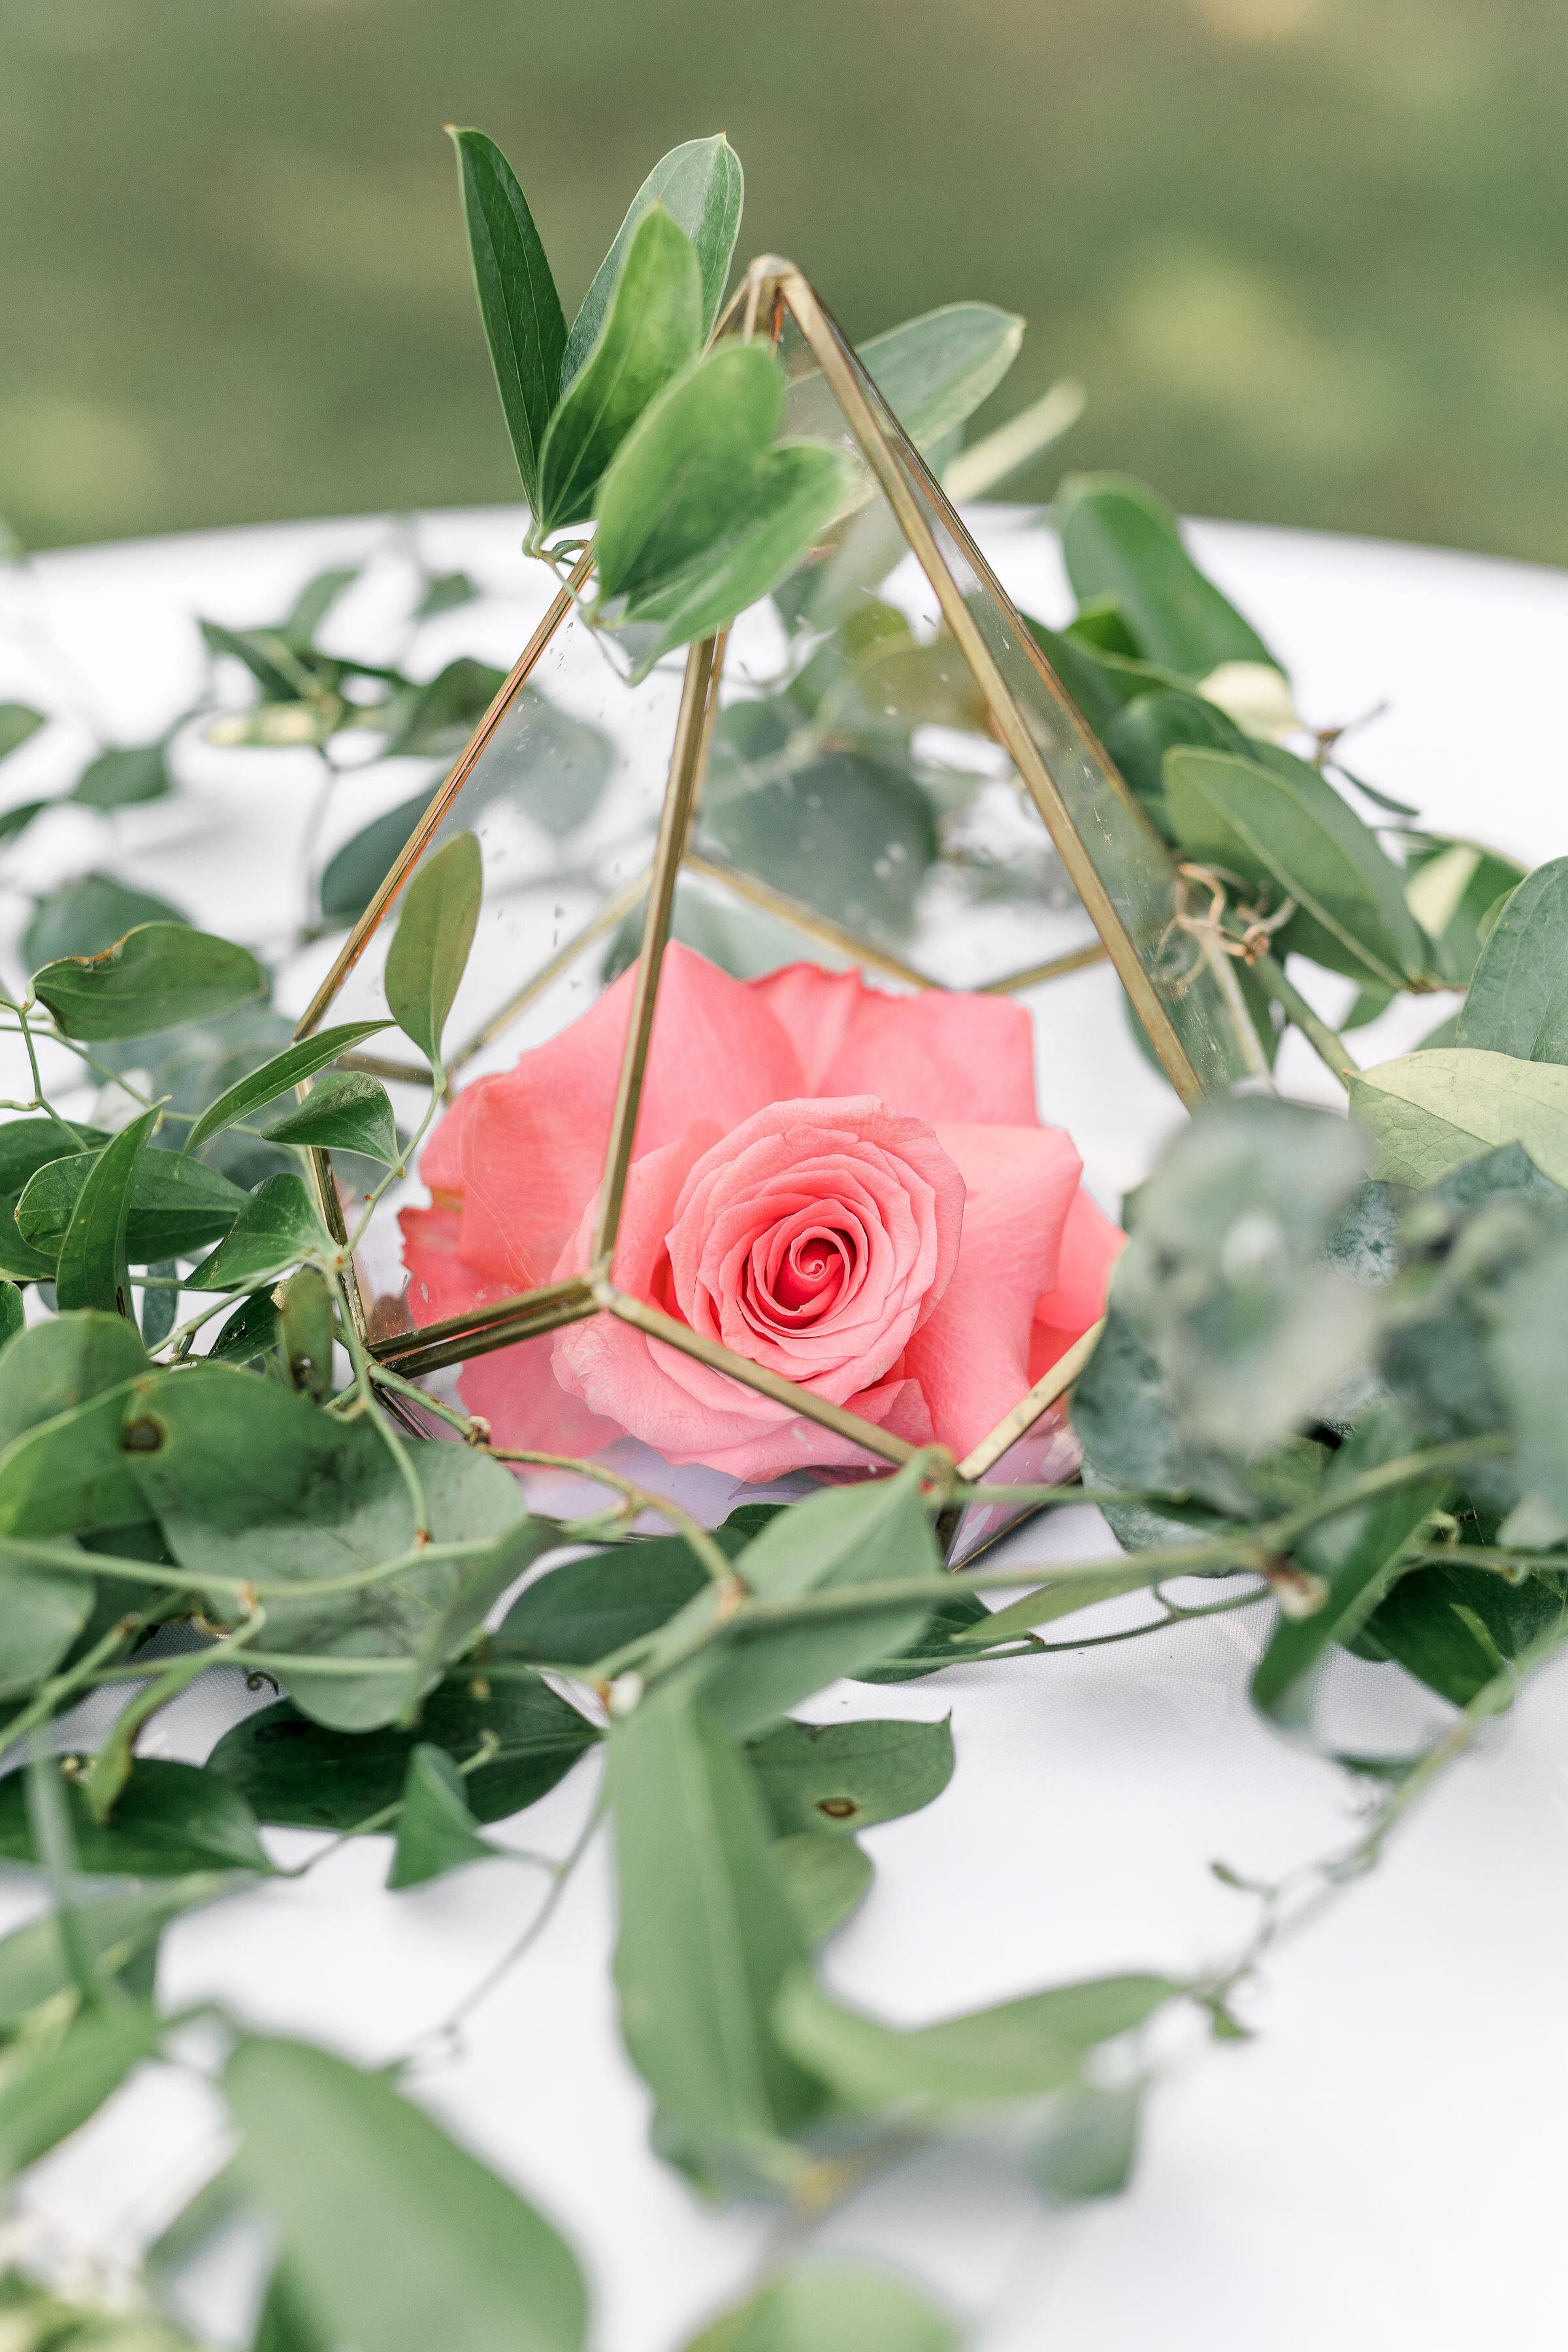 terrarium-centerpiece-rose-pink-and-green-simple-centerpice-bright-colorful-wedding-savannah-wedding-mackey-house-wedding-ivory-and-beau-centerpieces.jpg